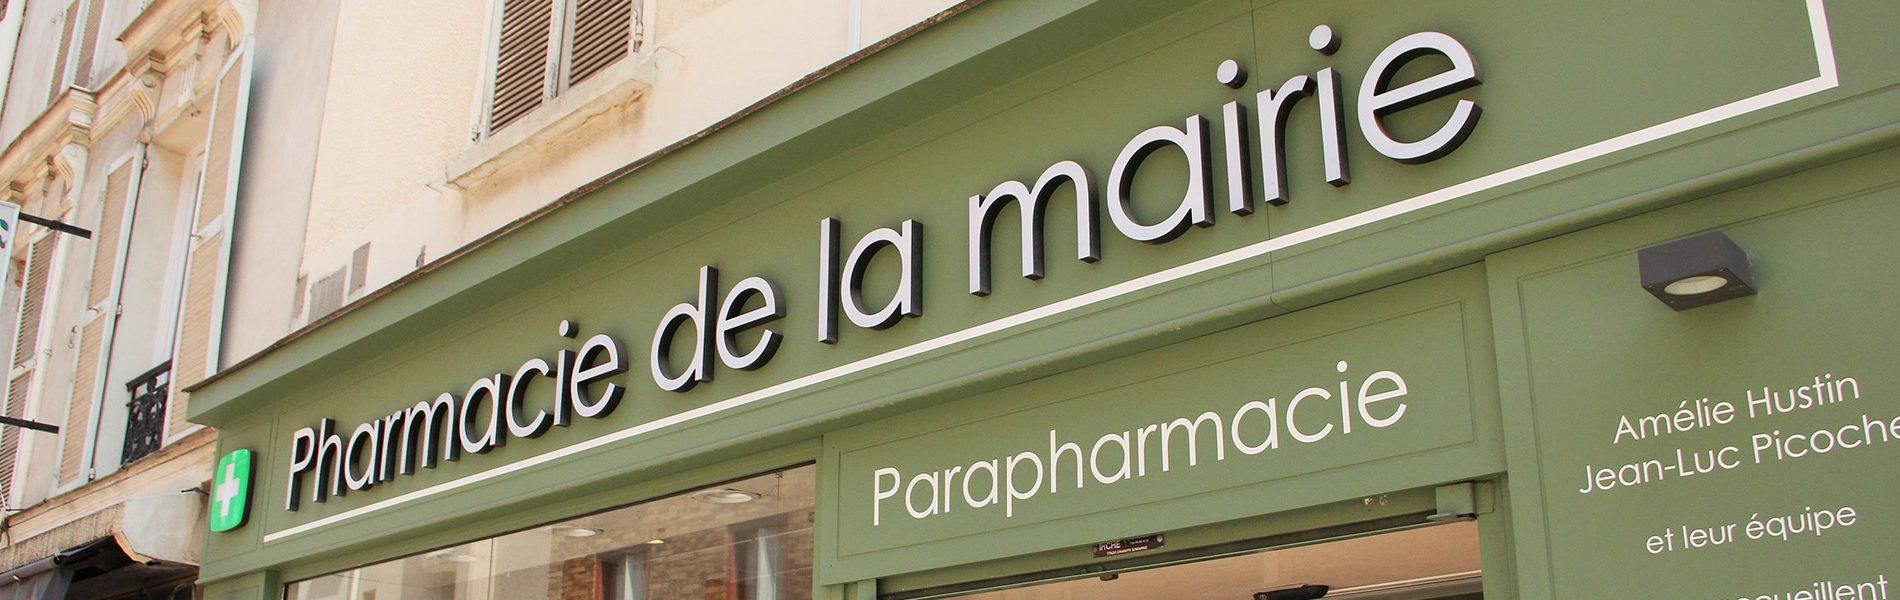 Pharmacie DE LA MAIRIE - Image Homepage 2